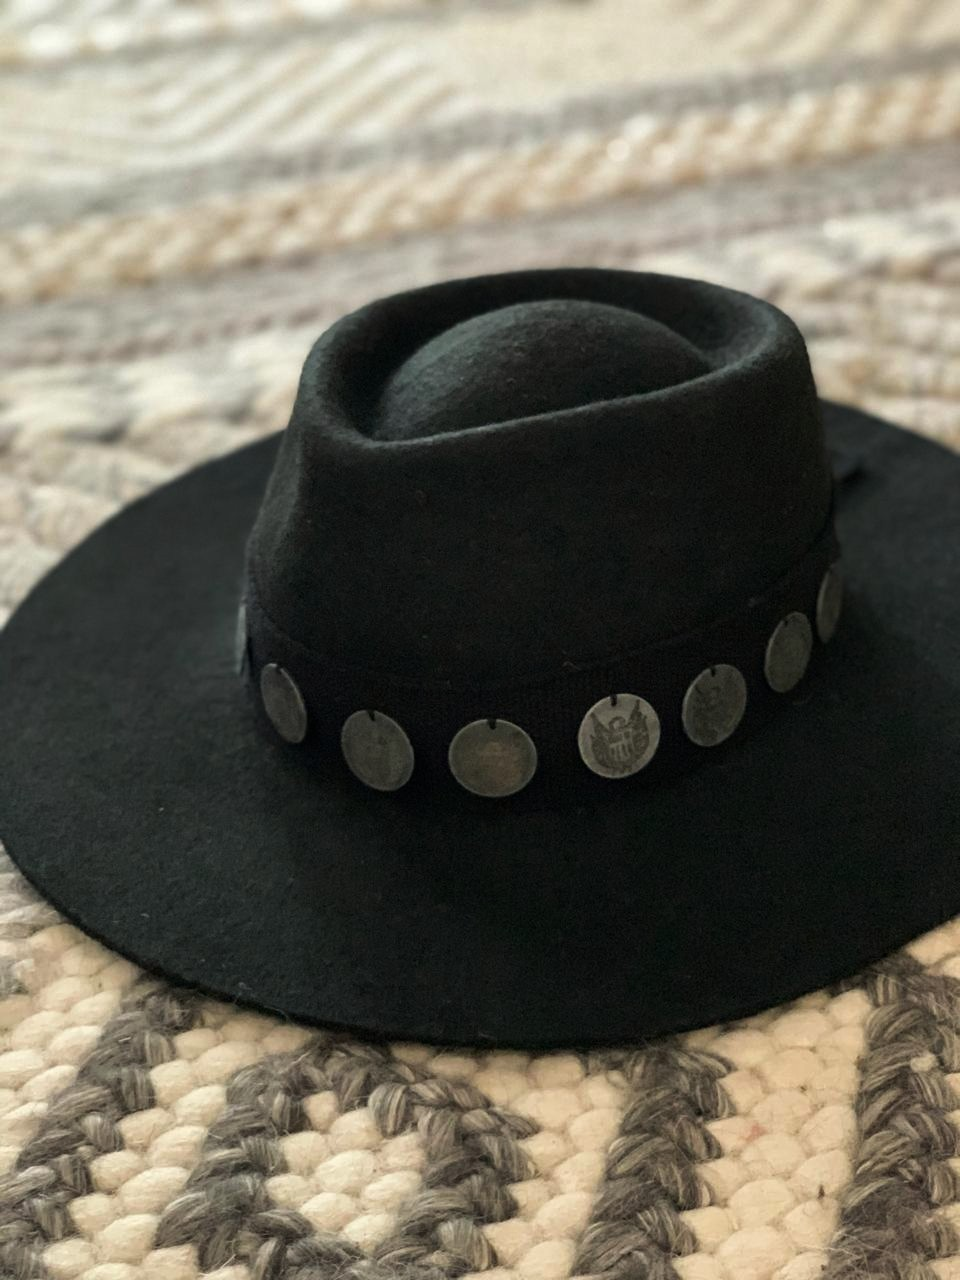 Monedas hat black 1